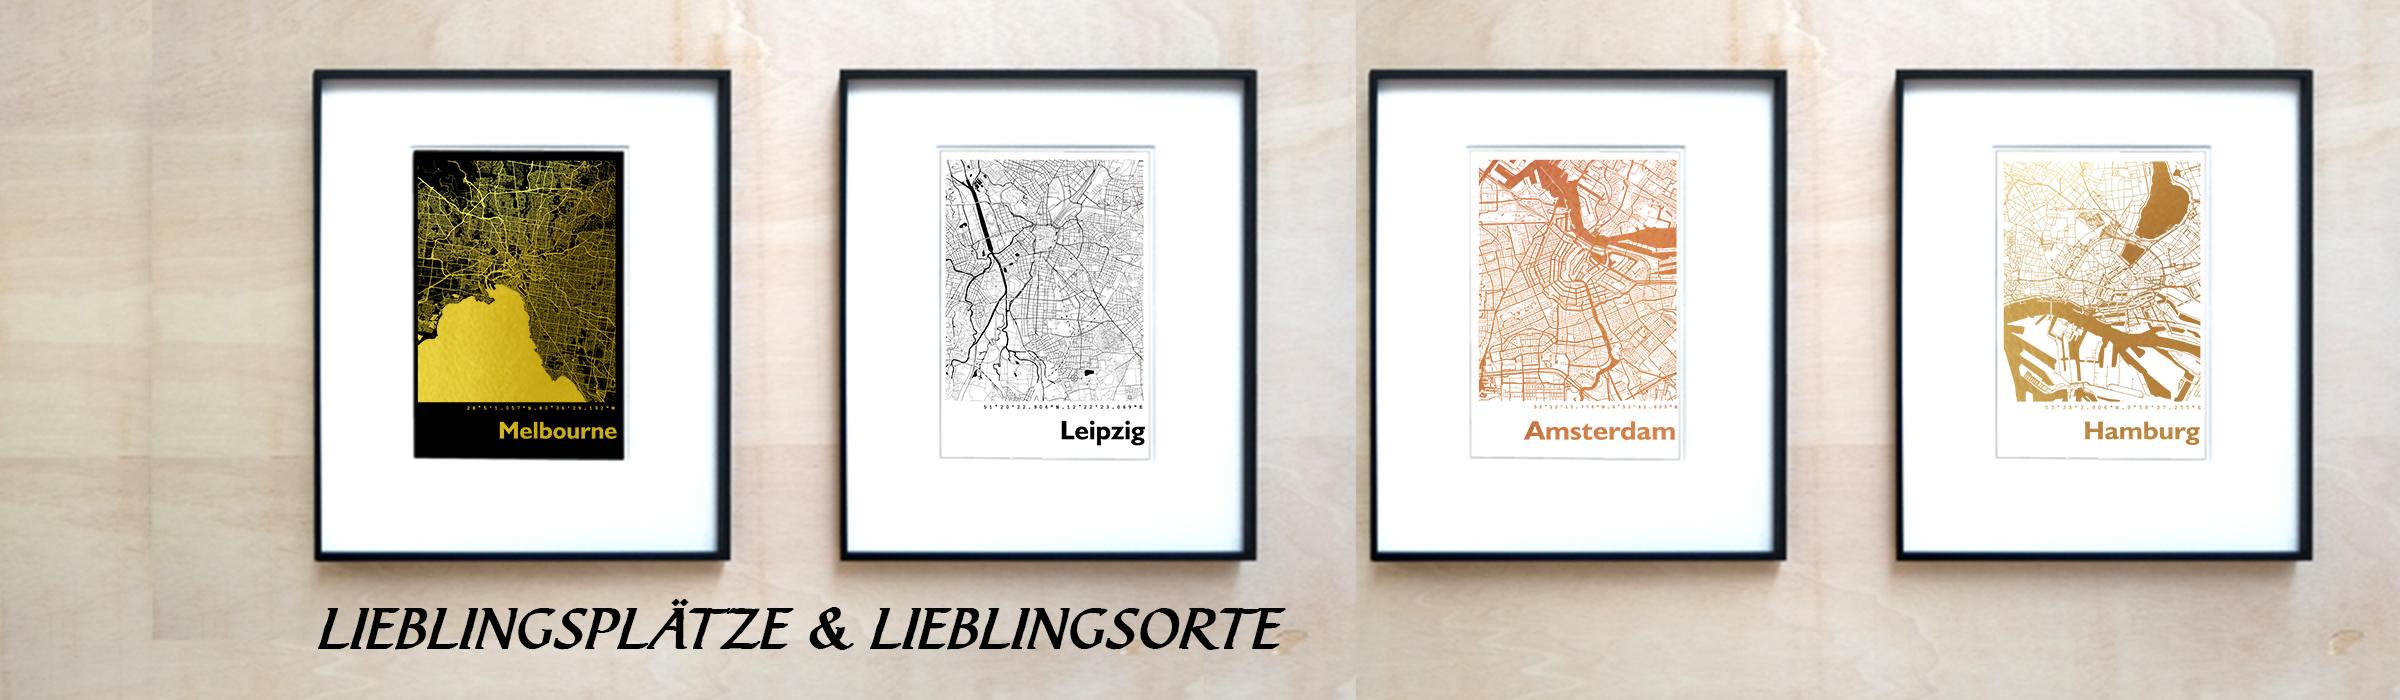 Bilder von Berlinger Designstudio 44spaces